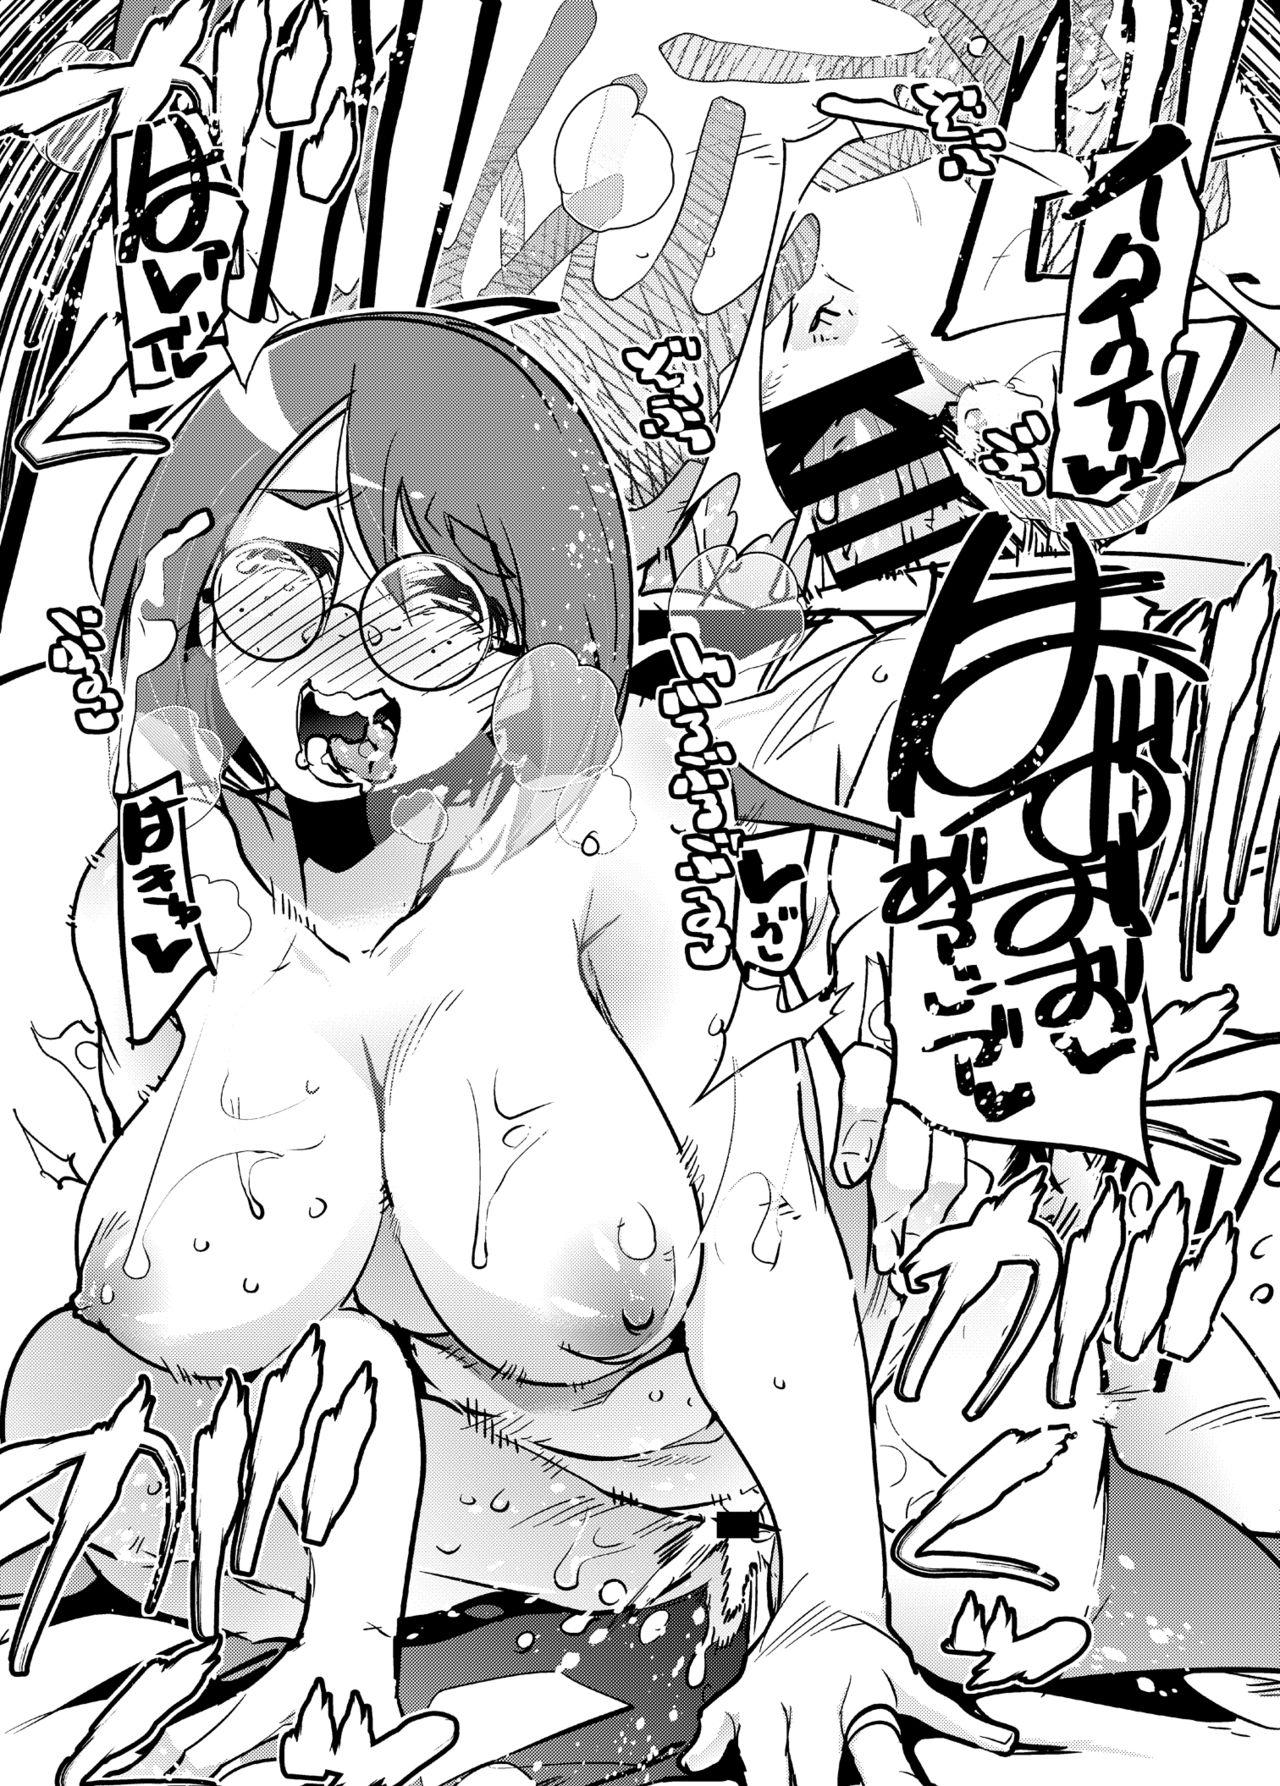 Weekly SeFri Oba-san 23